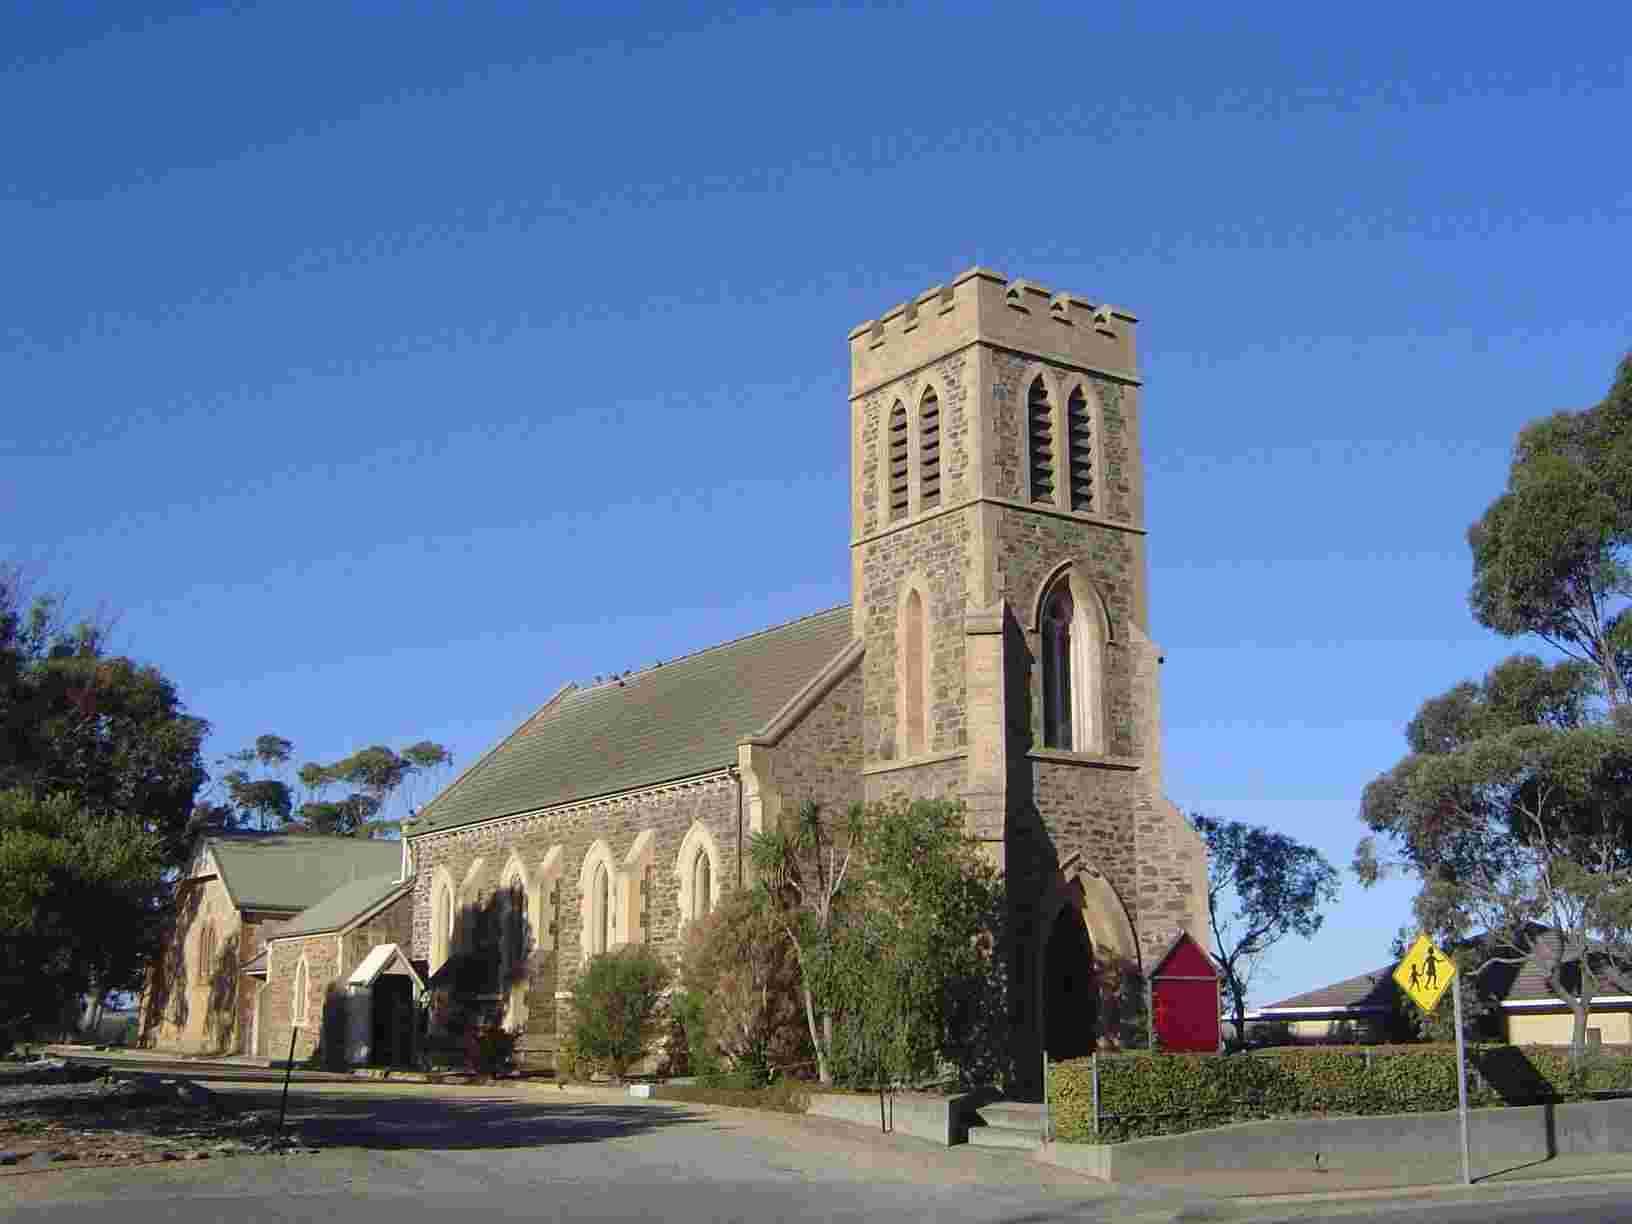 Strathalbyn Australia  city pictures gallery : Strathalbyn Fleurieu Peninsula, South Australia.